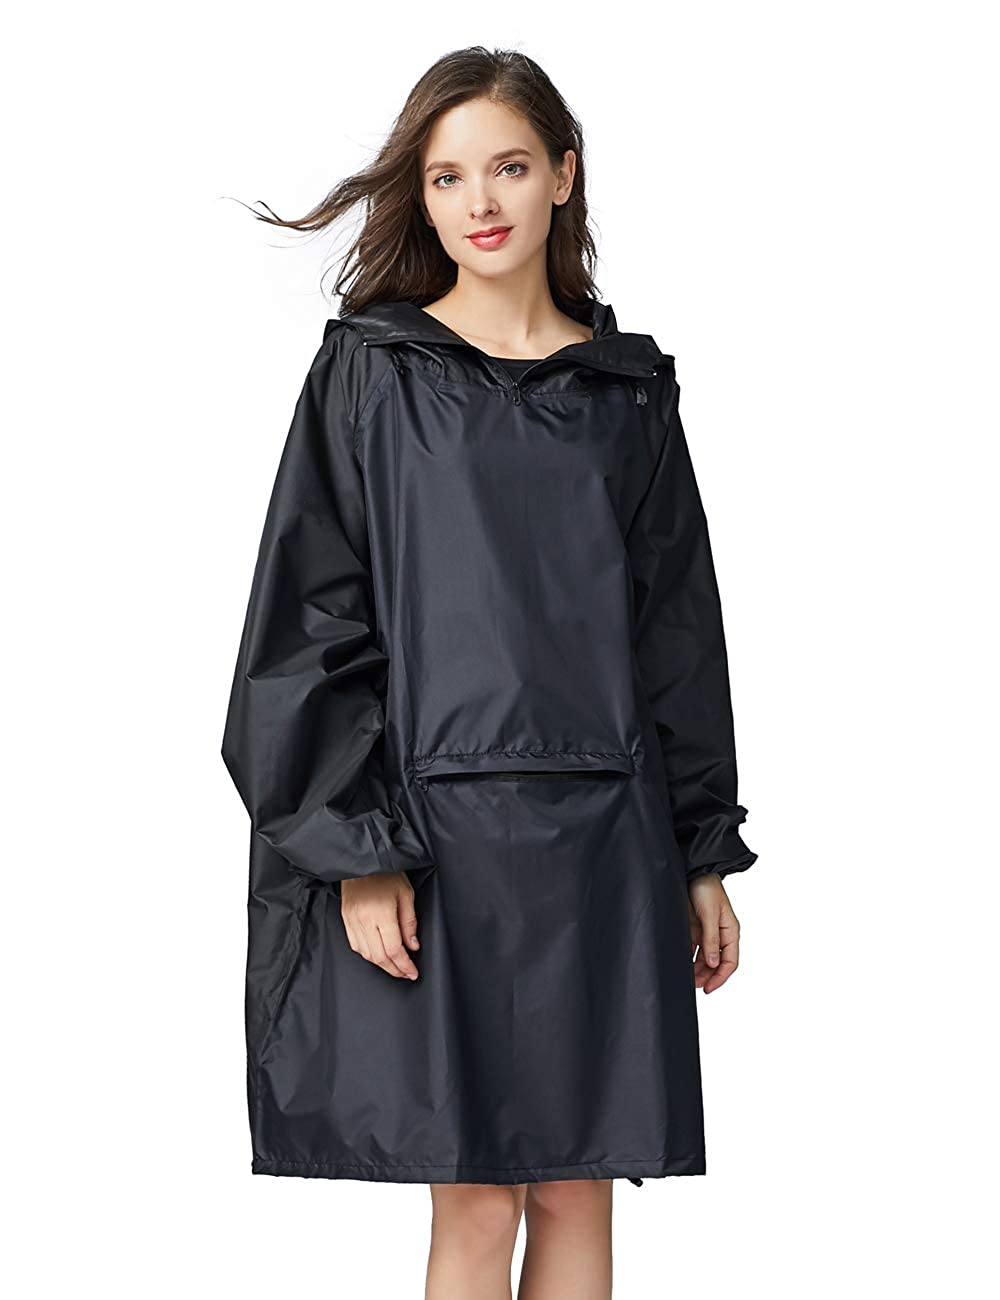 Diliba Women's Waterproof Raincoat Lightweight Packable Rain Coat Poncho Hooded DYYI-Y1832